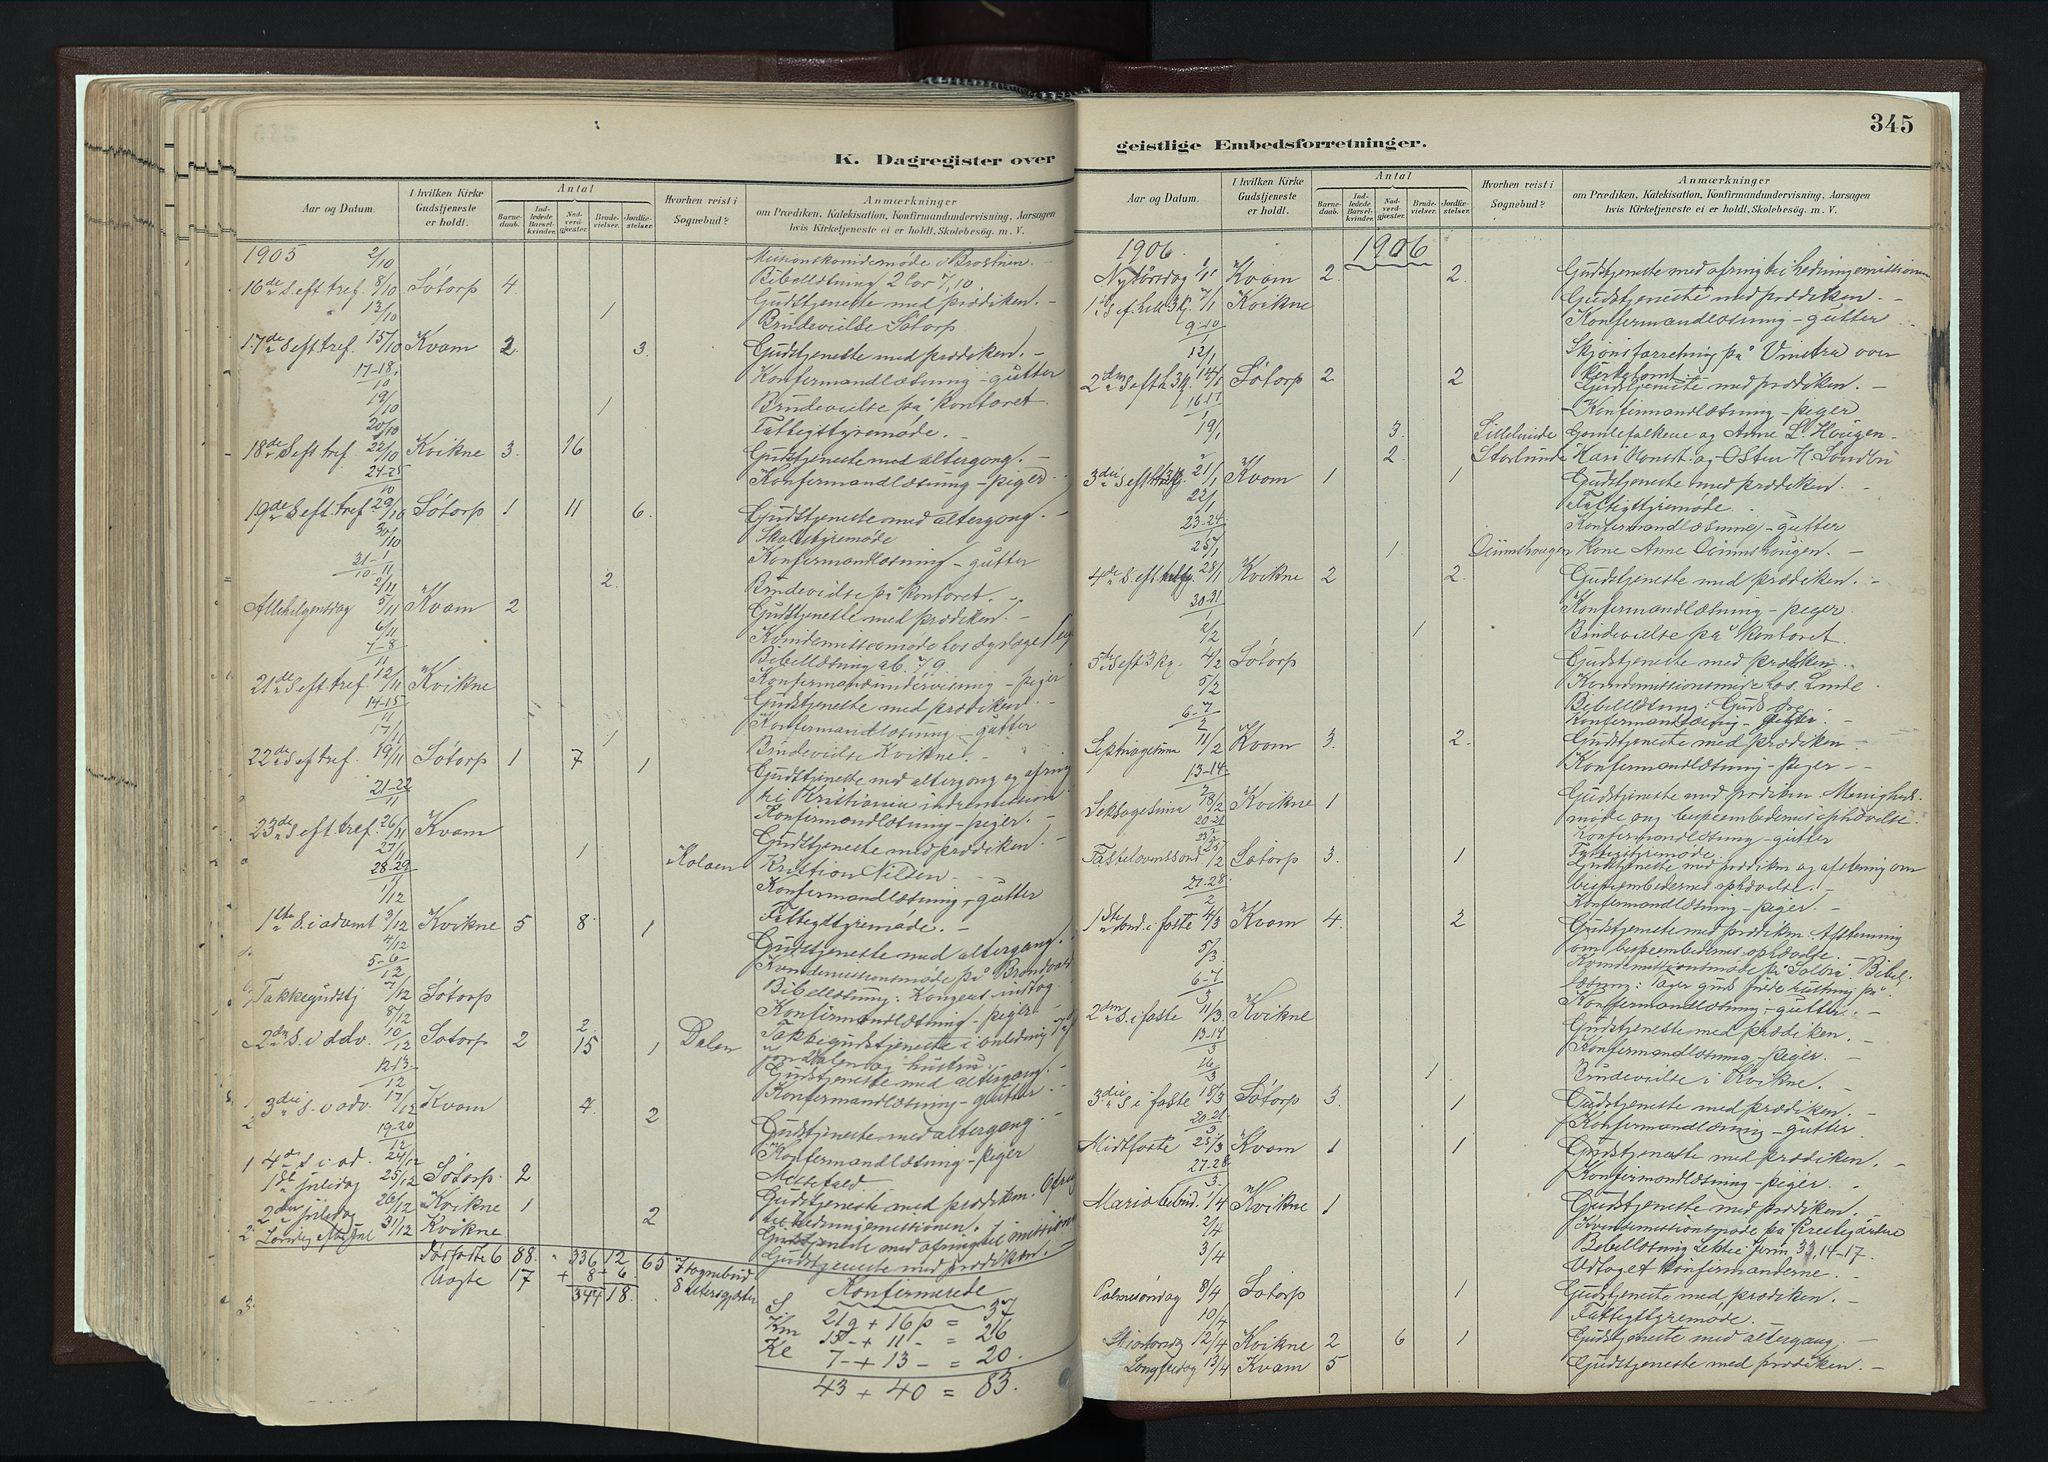 SAH, Nord-Fron prestekontor, Ministerialbok nr. 4, 1884-1914, s. 345